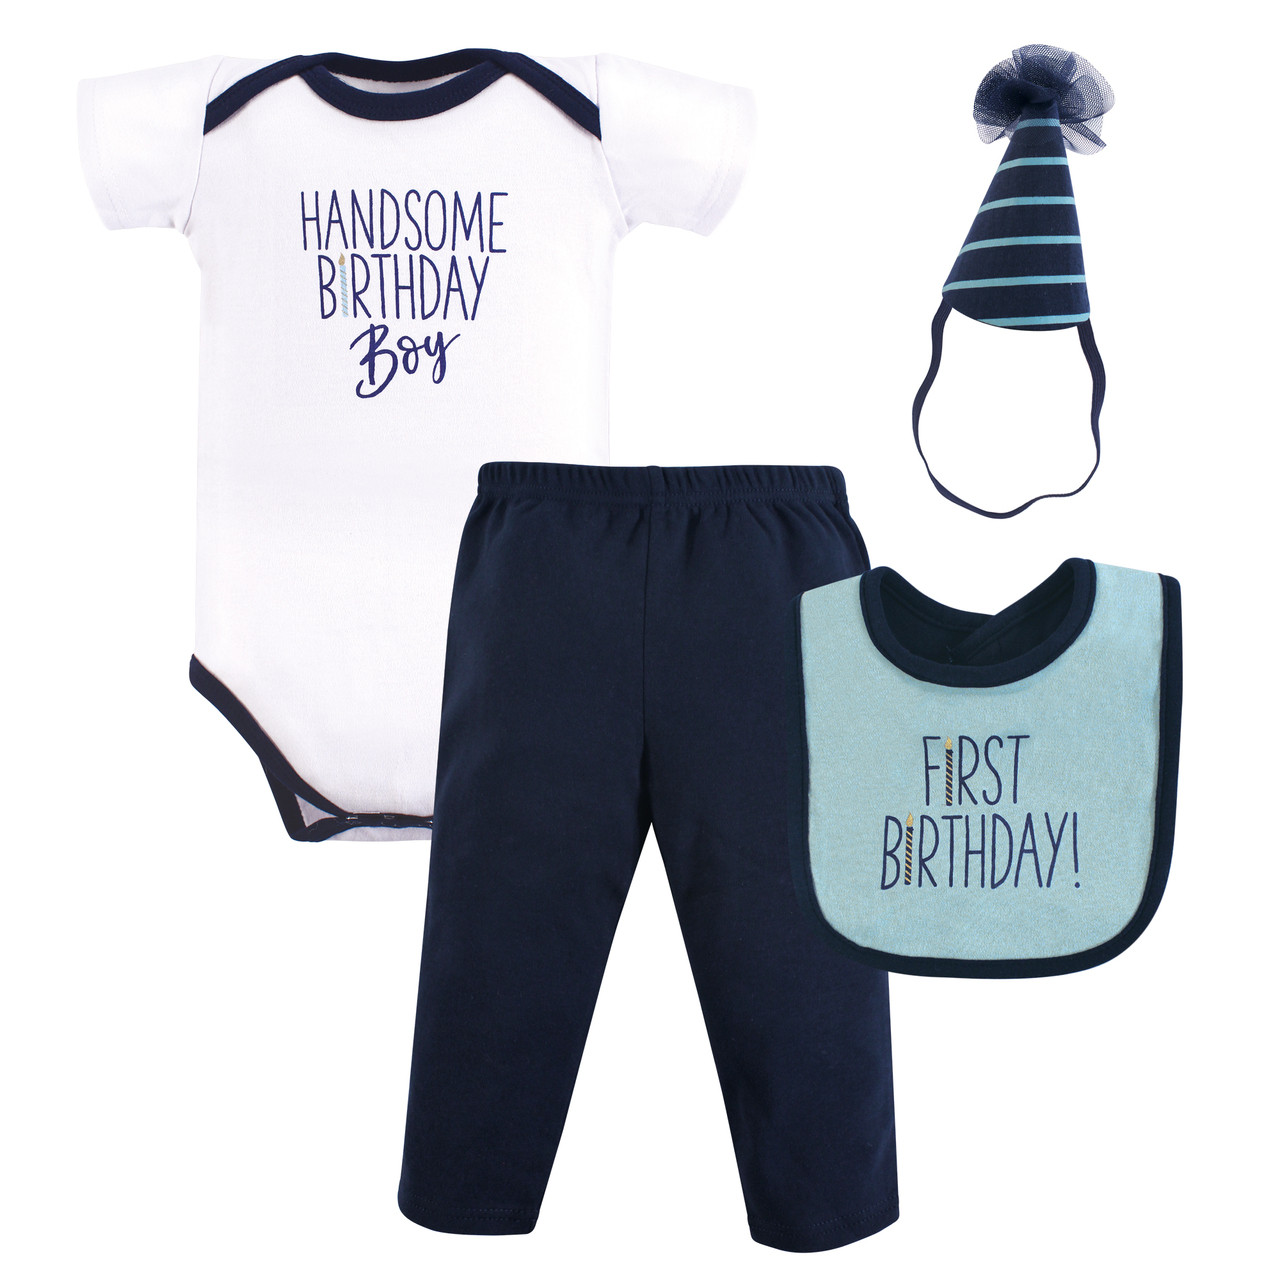 First Birthday Outfit Gift Set 4 Piece Handsome Boy 12 Months